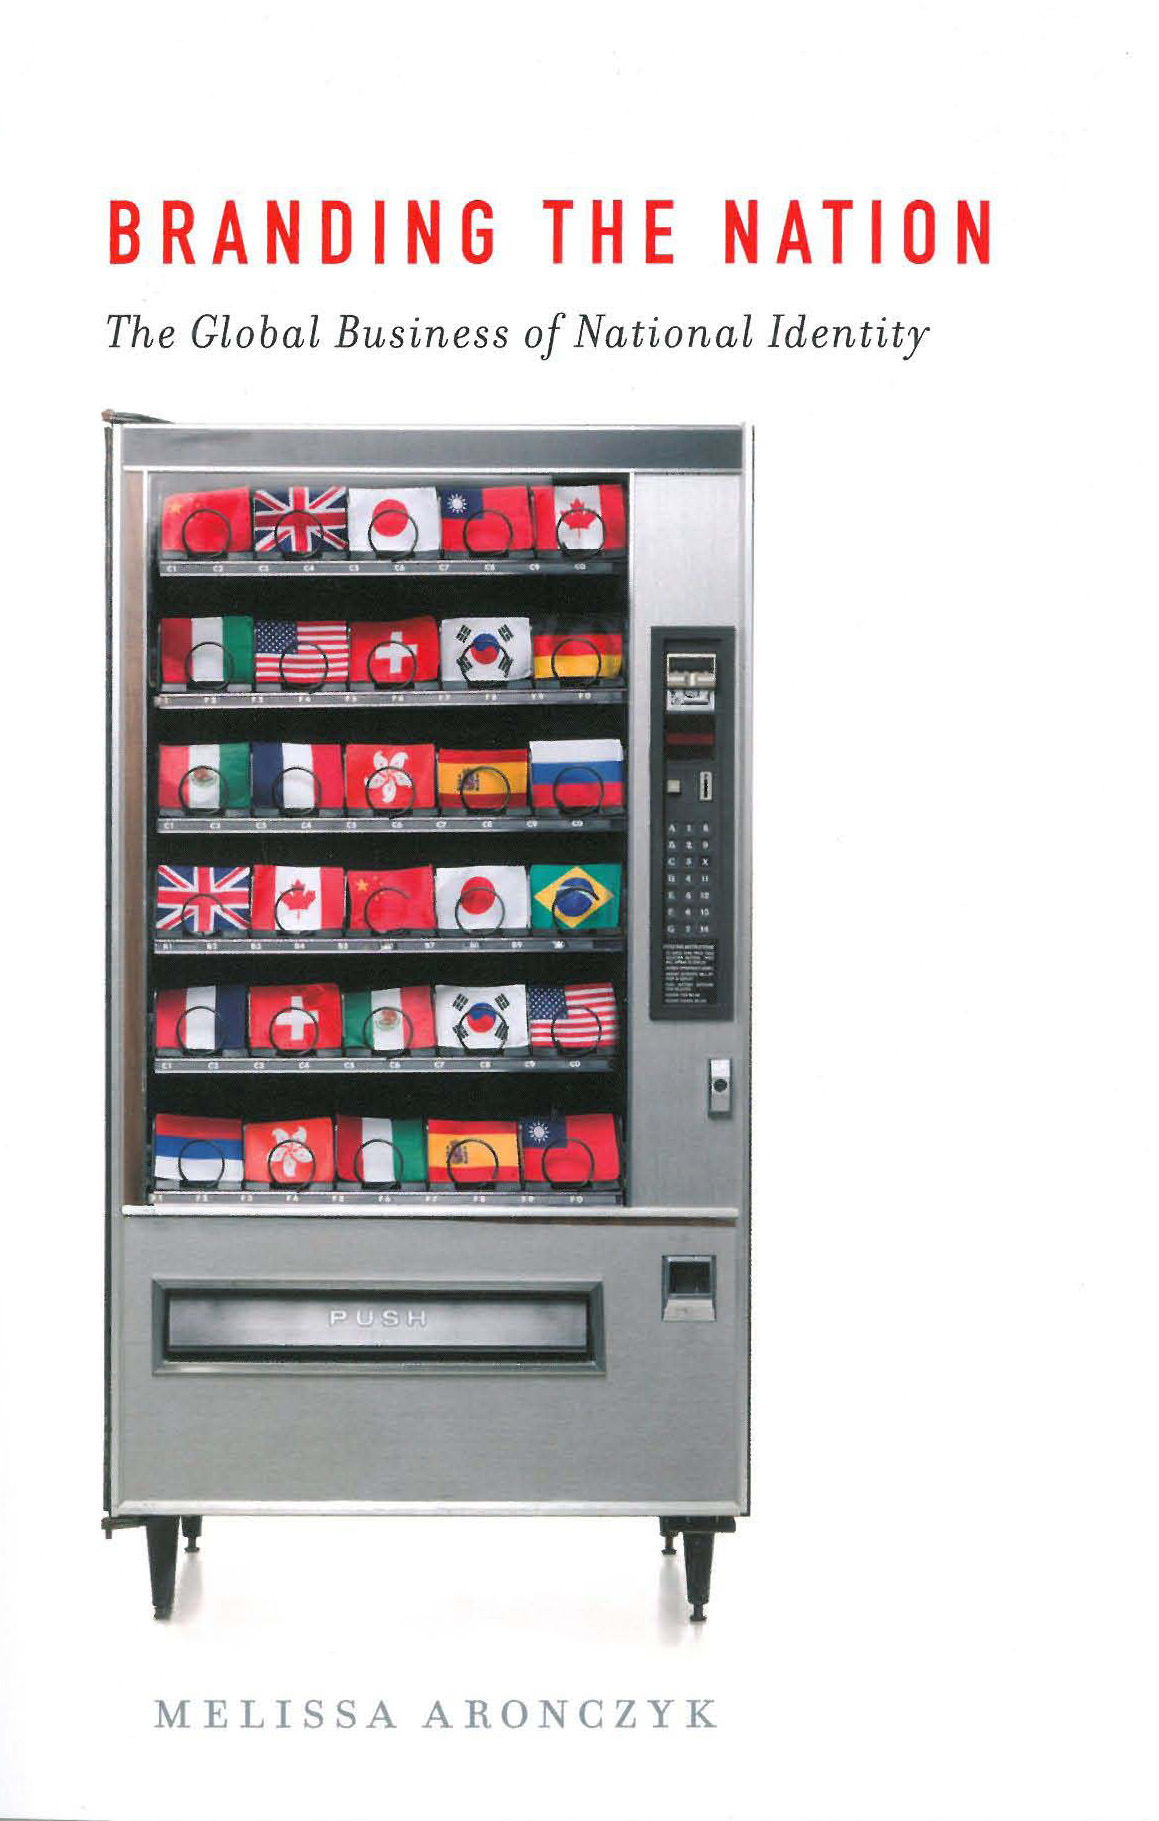 Melissa Aronczyk: Branding the Nation. The Global Business of National Identity. Oxford University Press 2013, 256 s.